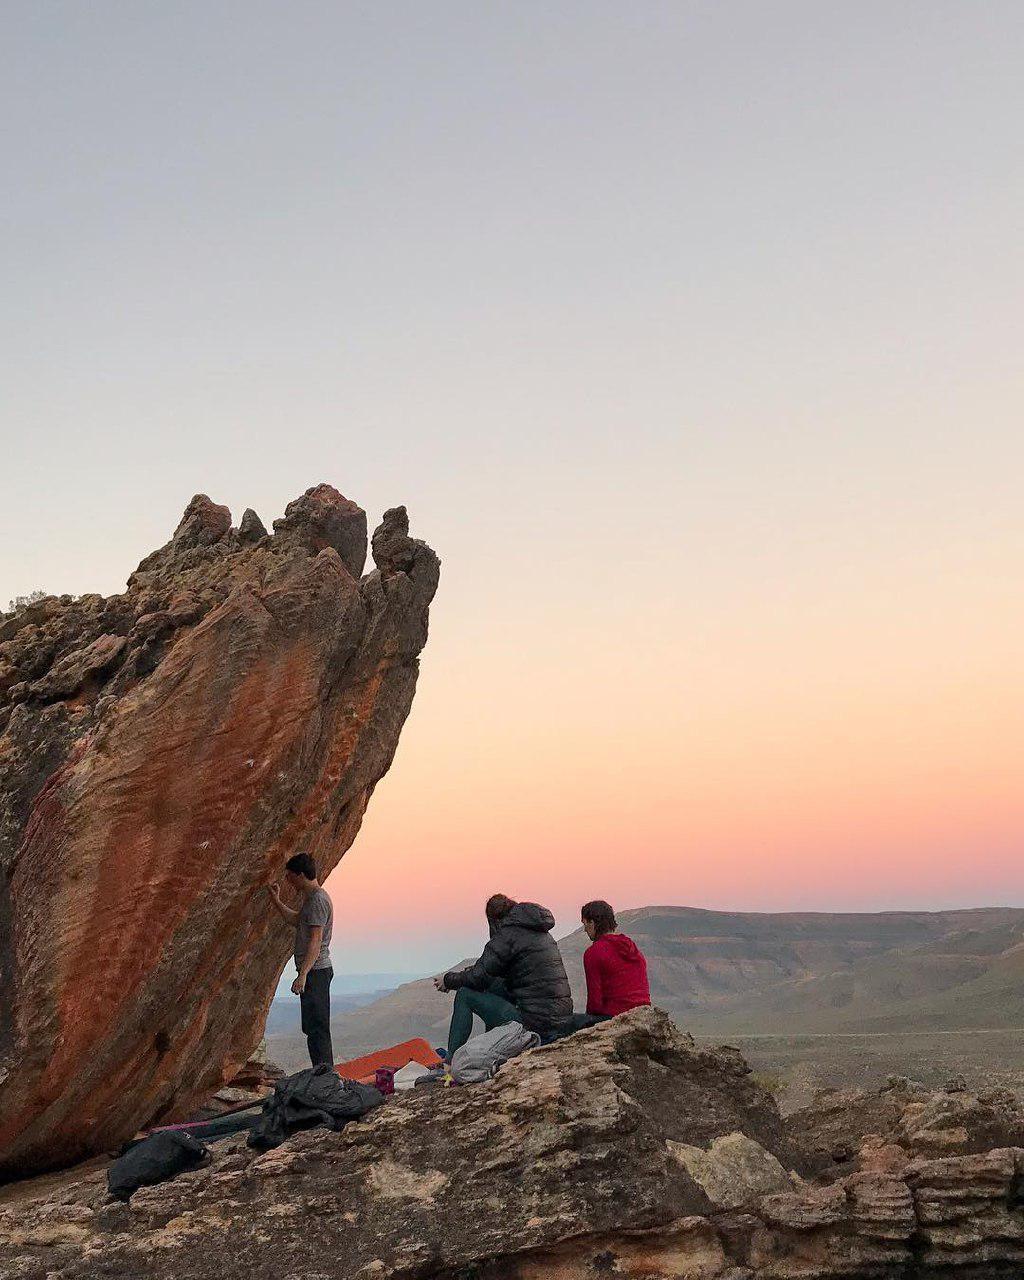 Boulder e Sud Africa - Novelle d'arrampicata